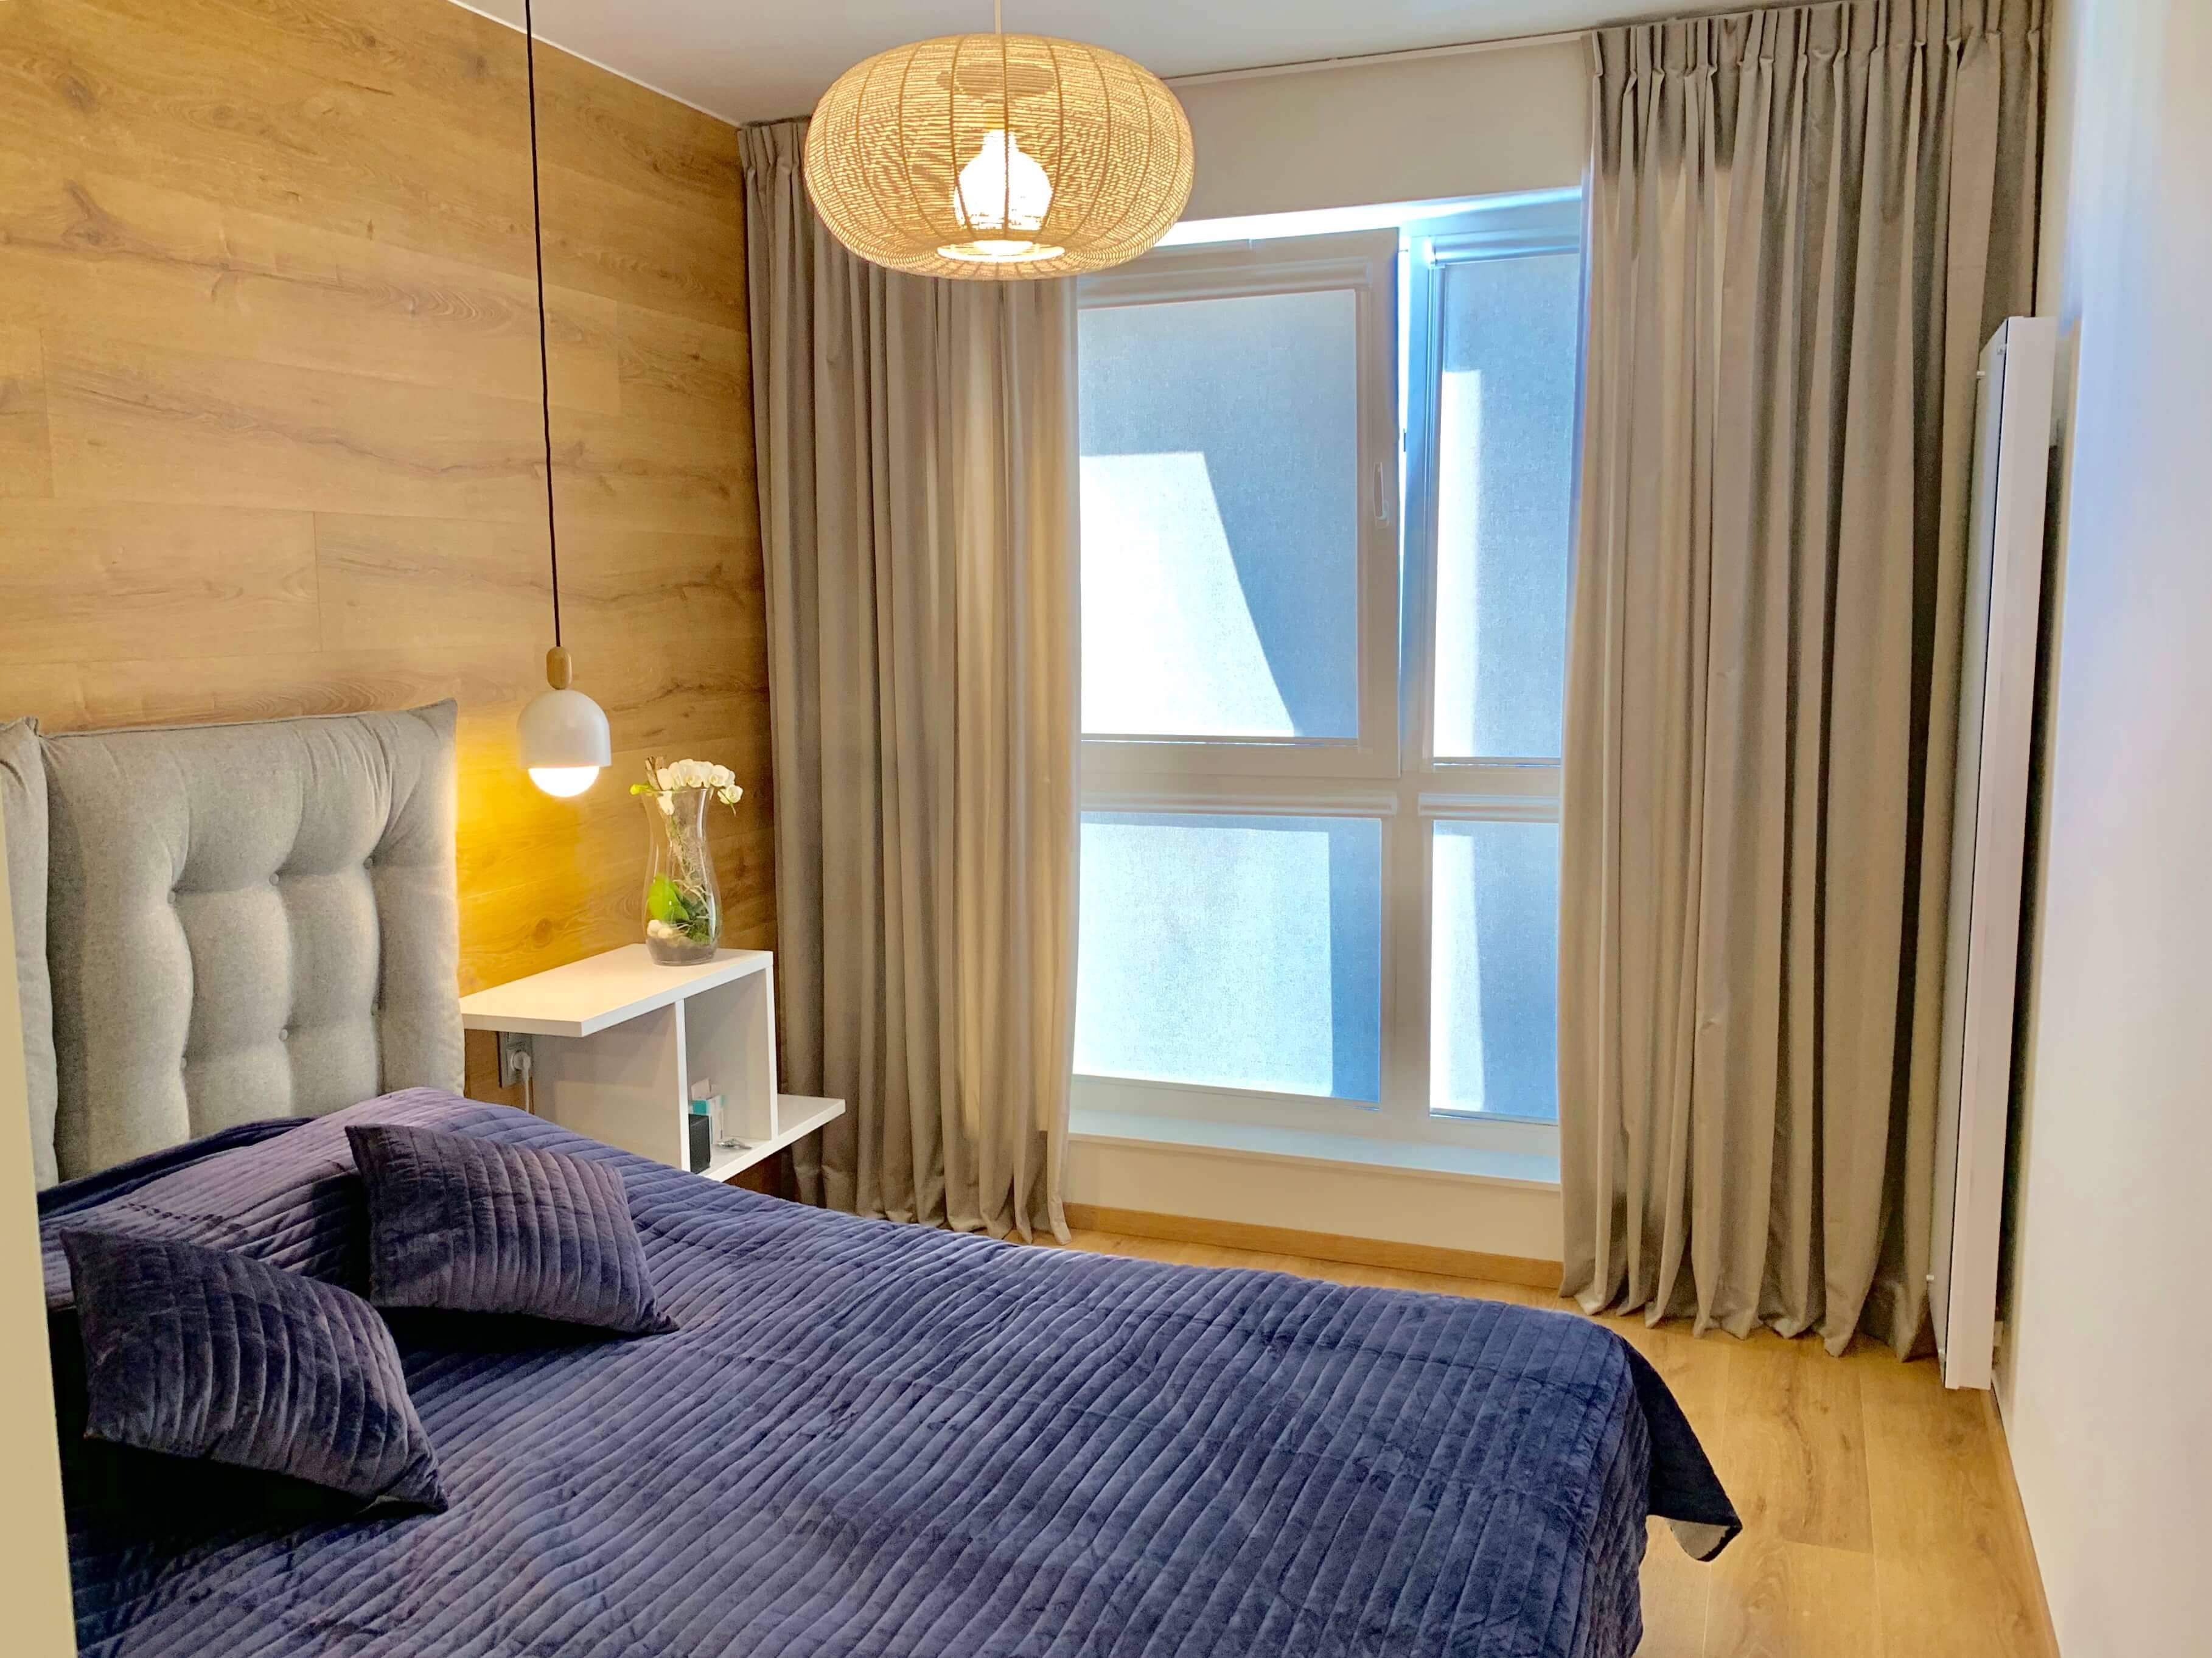 Sypialnia drewno plus welur